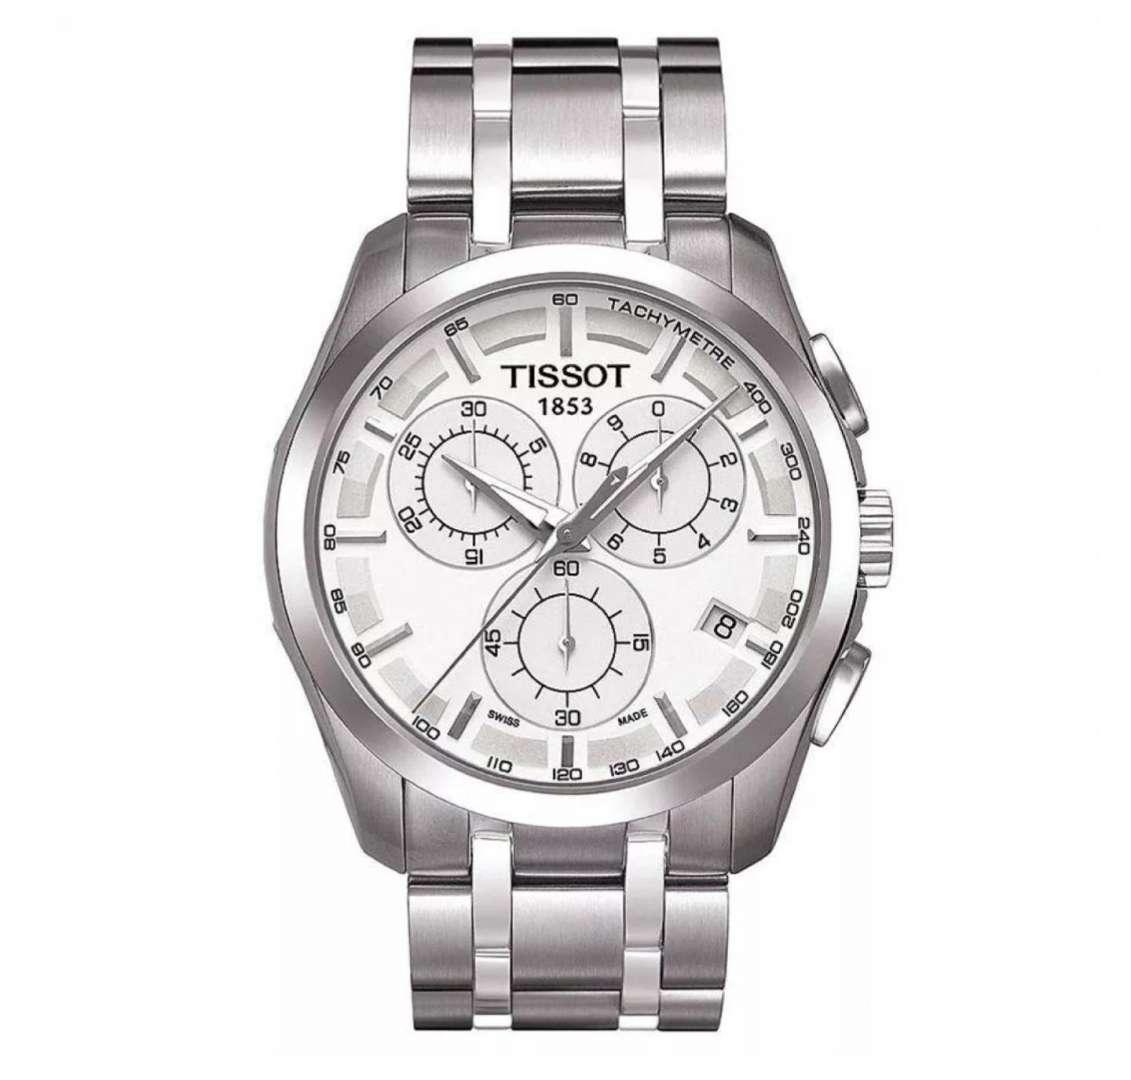 שעון יד אנלוגי tissot t035.617.11.031.00 טיסו